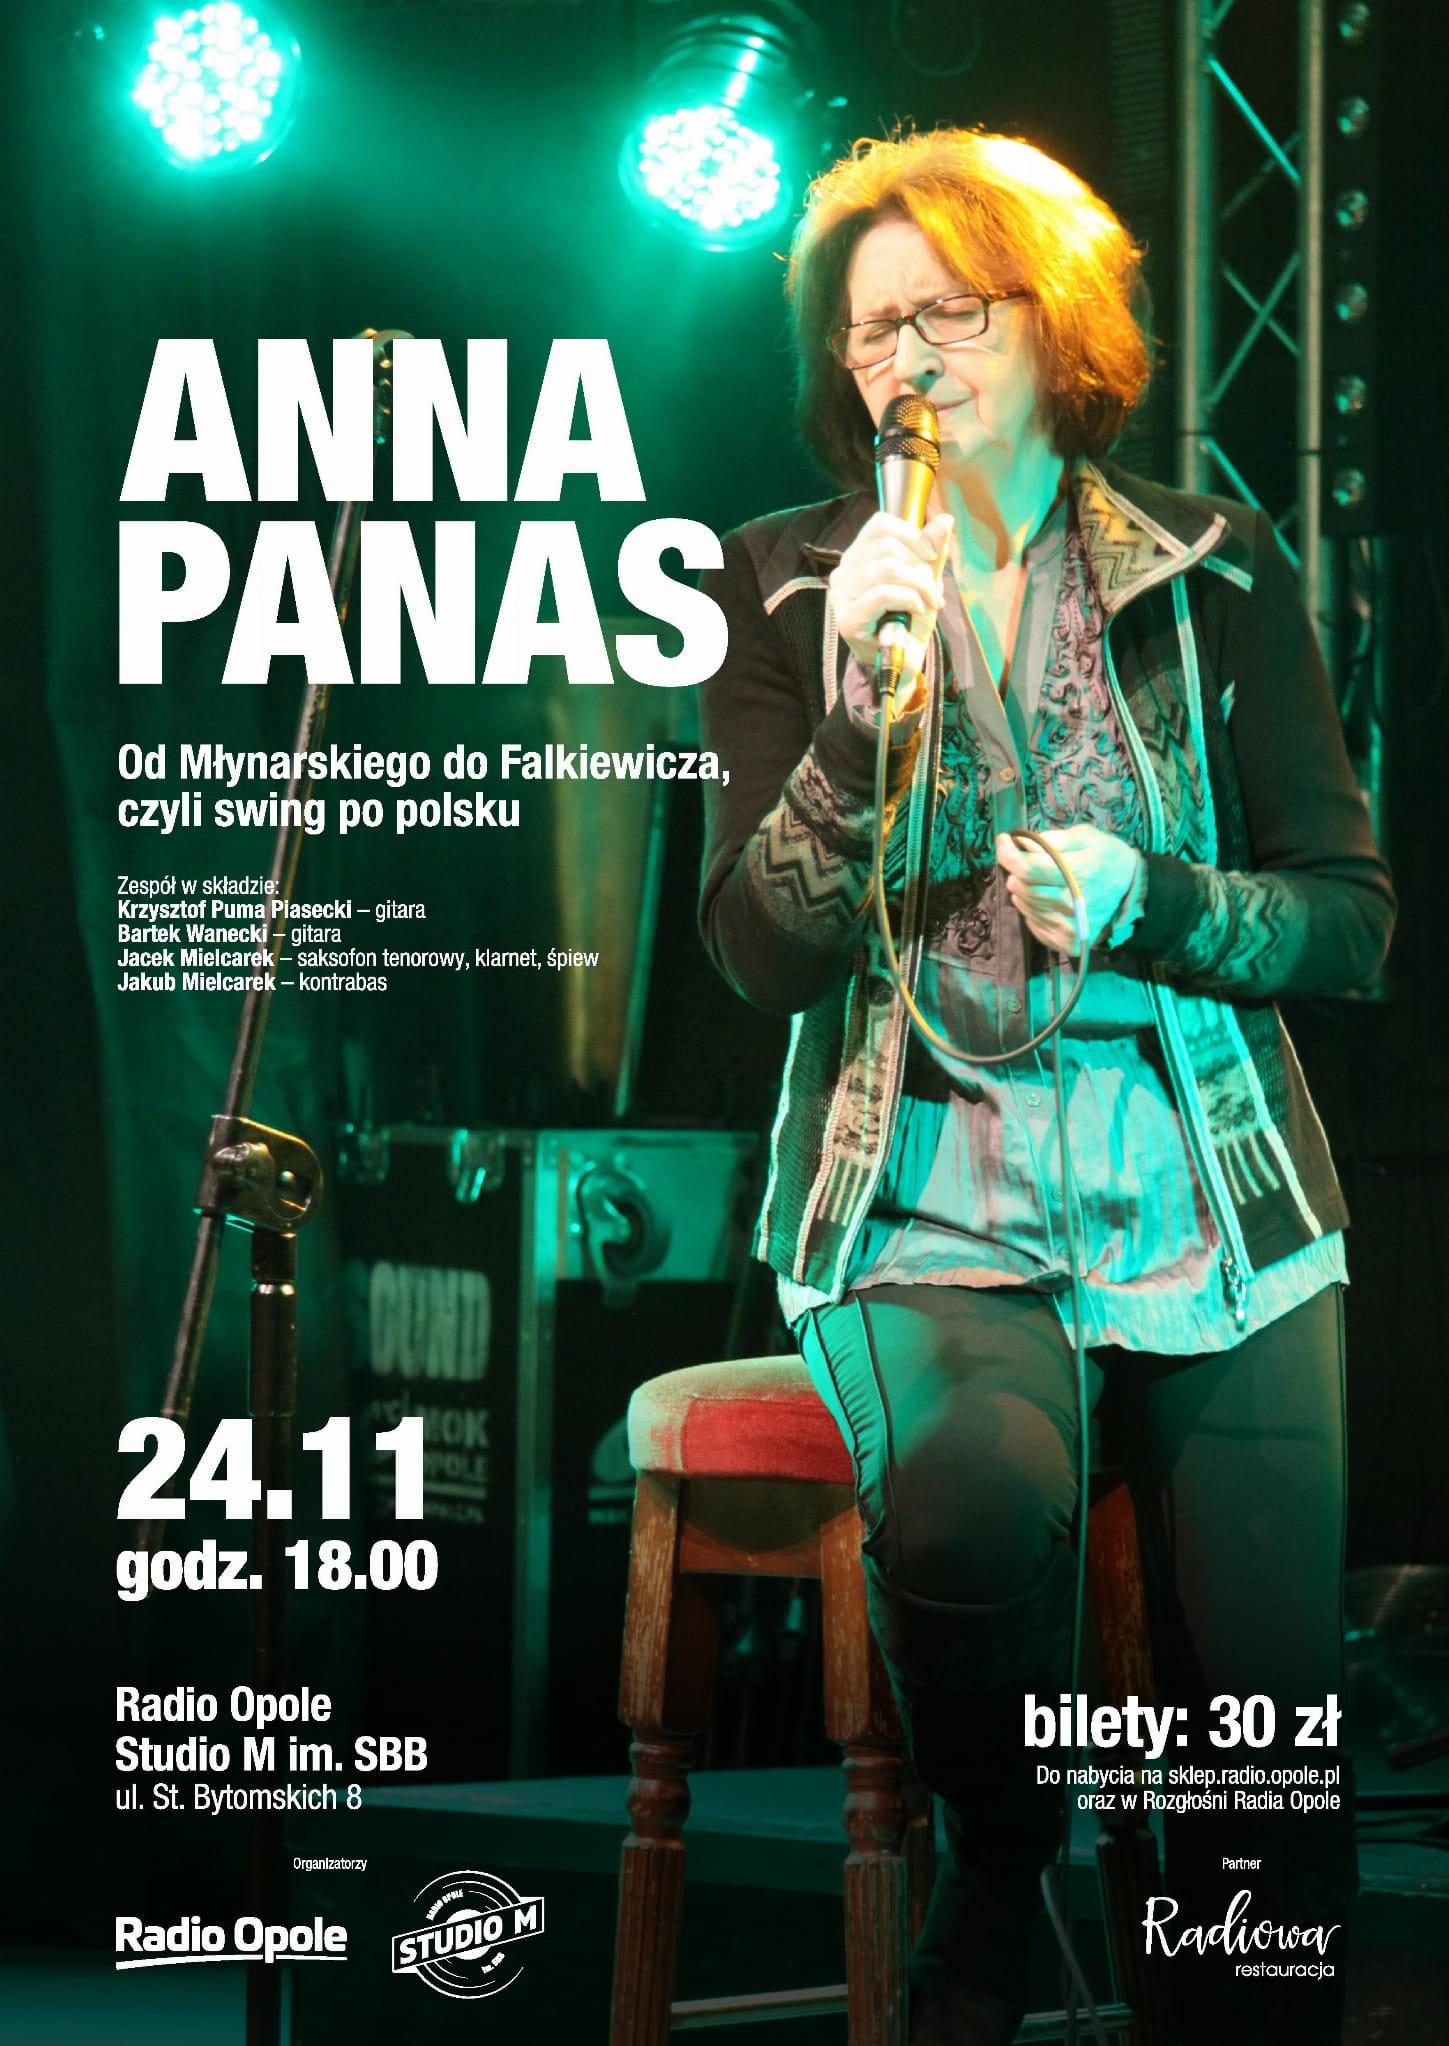 Koncert Anny Panas w Studiu M im. SBB